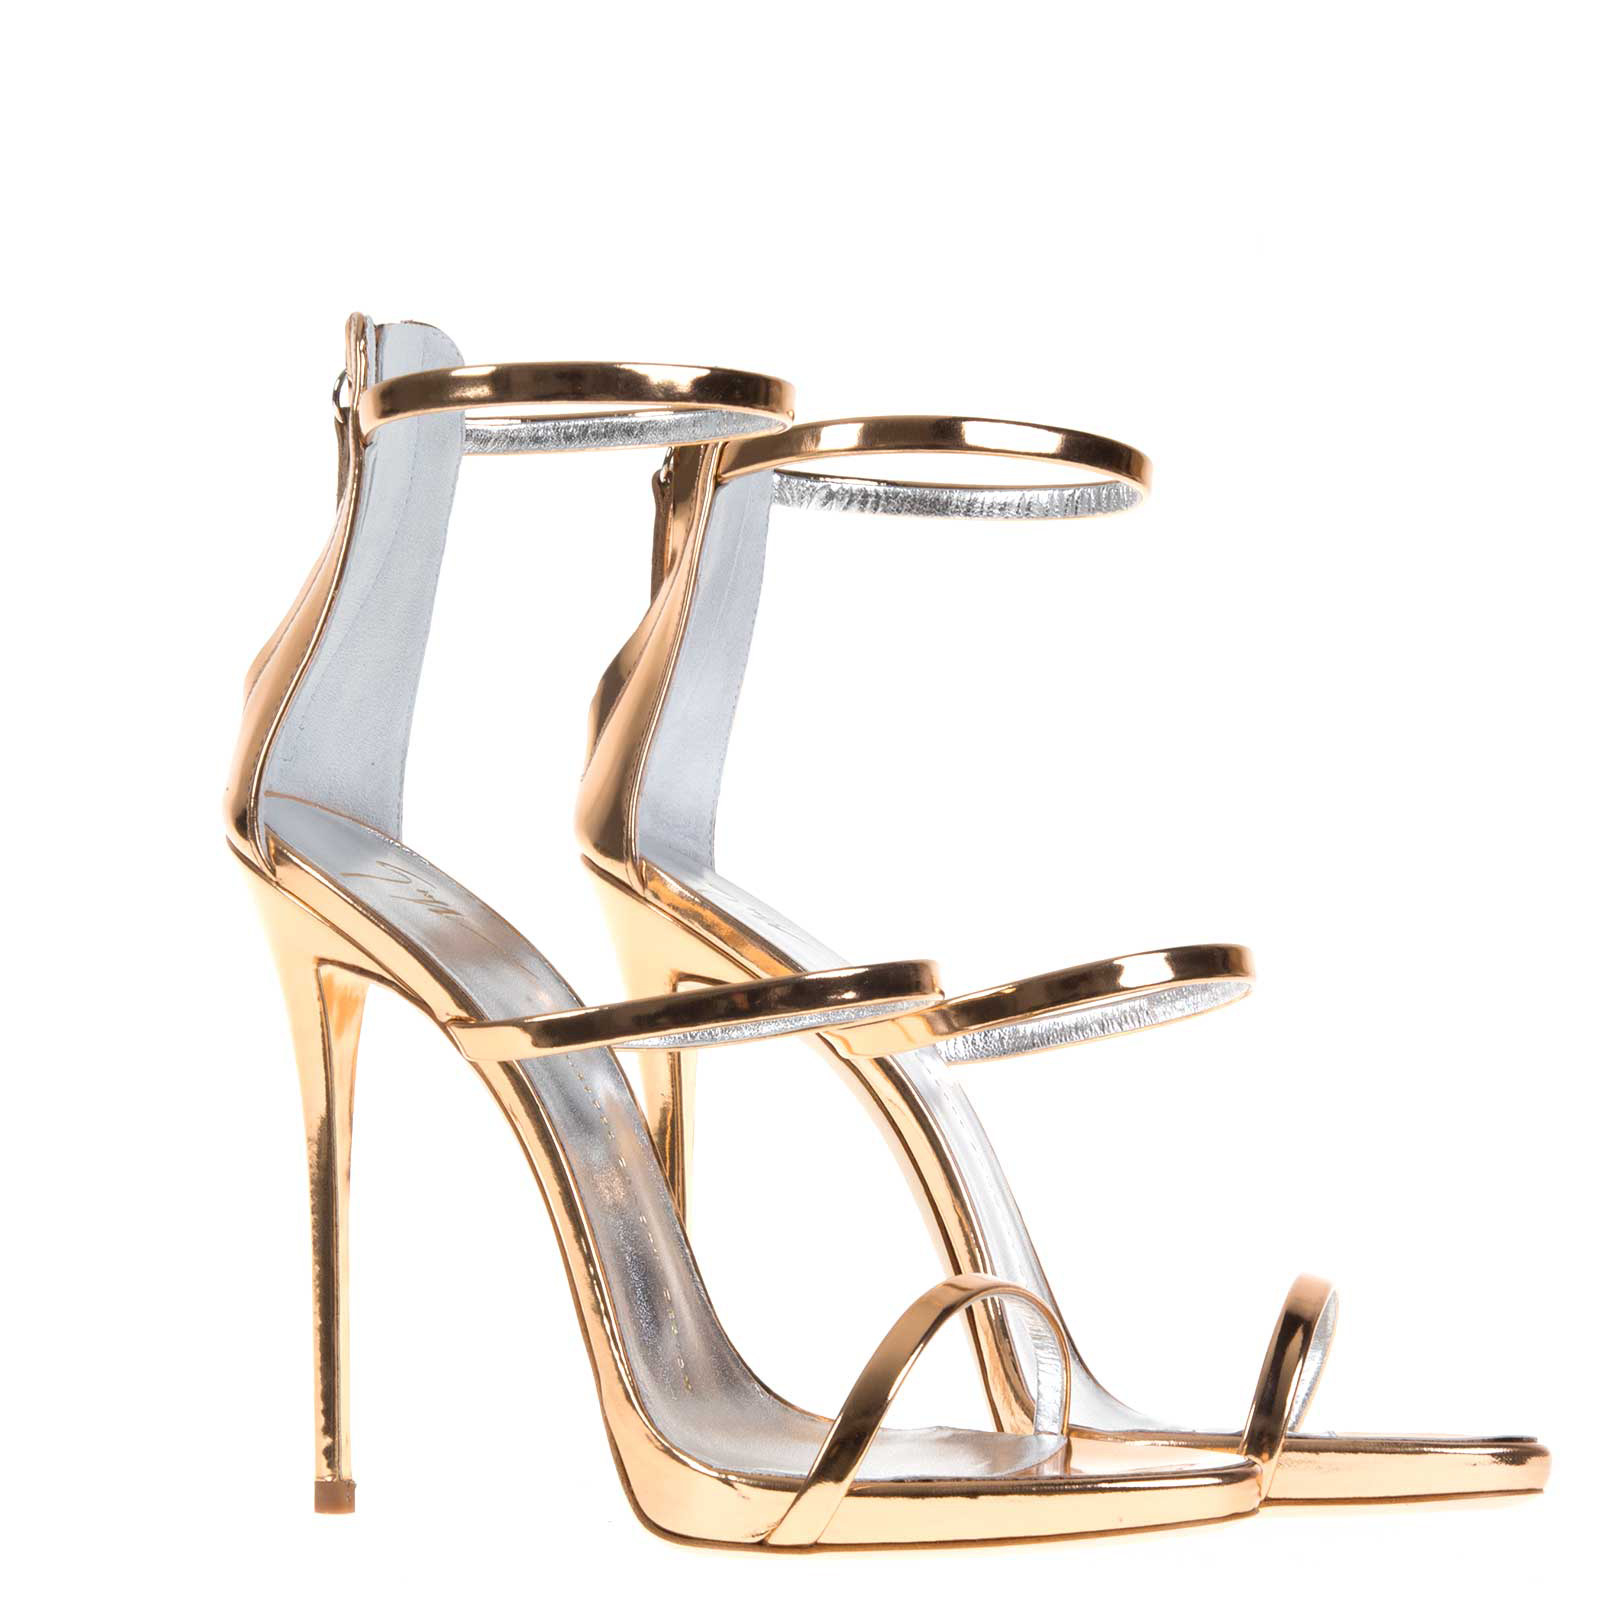 Harmony Metallic Leather Sandals - Gold Giuseppe Zanotti 4fp85Az4